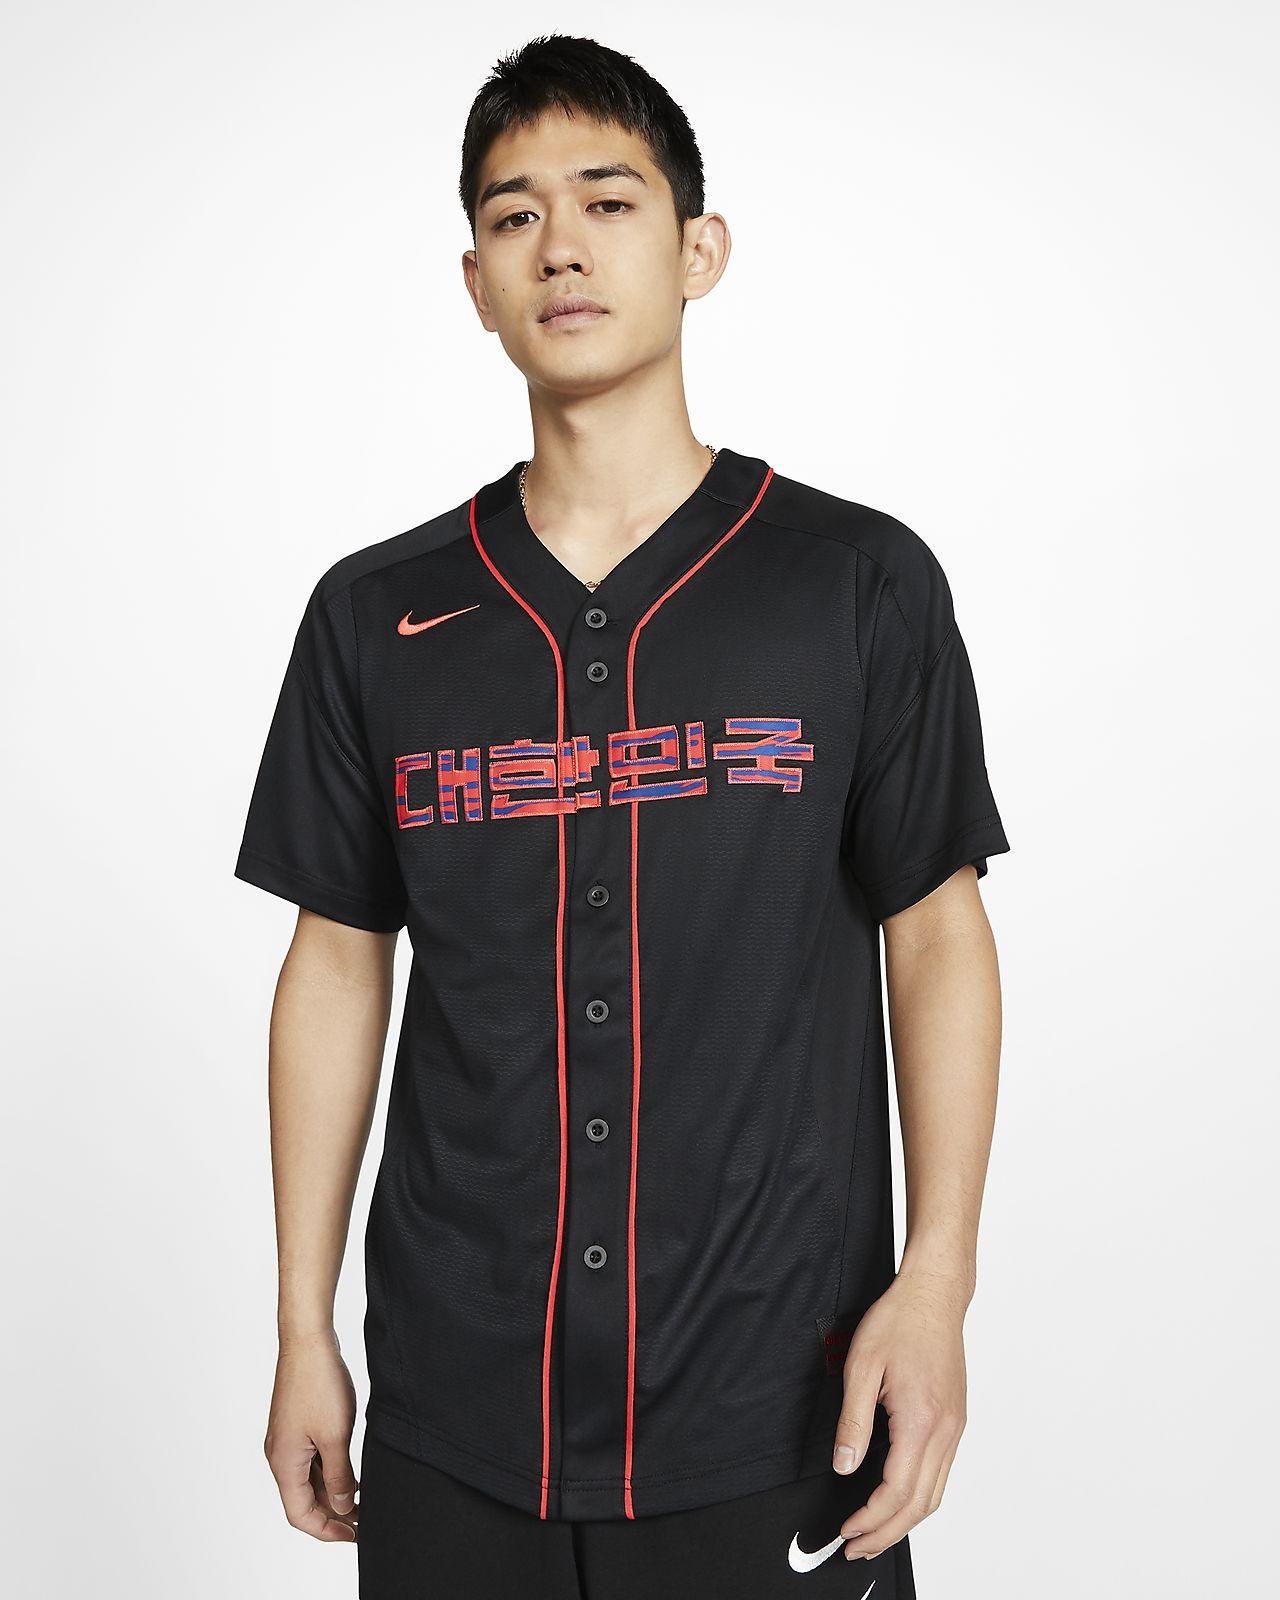 Korea Men's Baseball Jersey